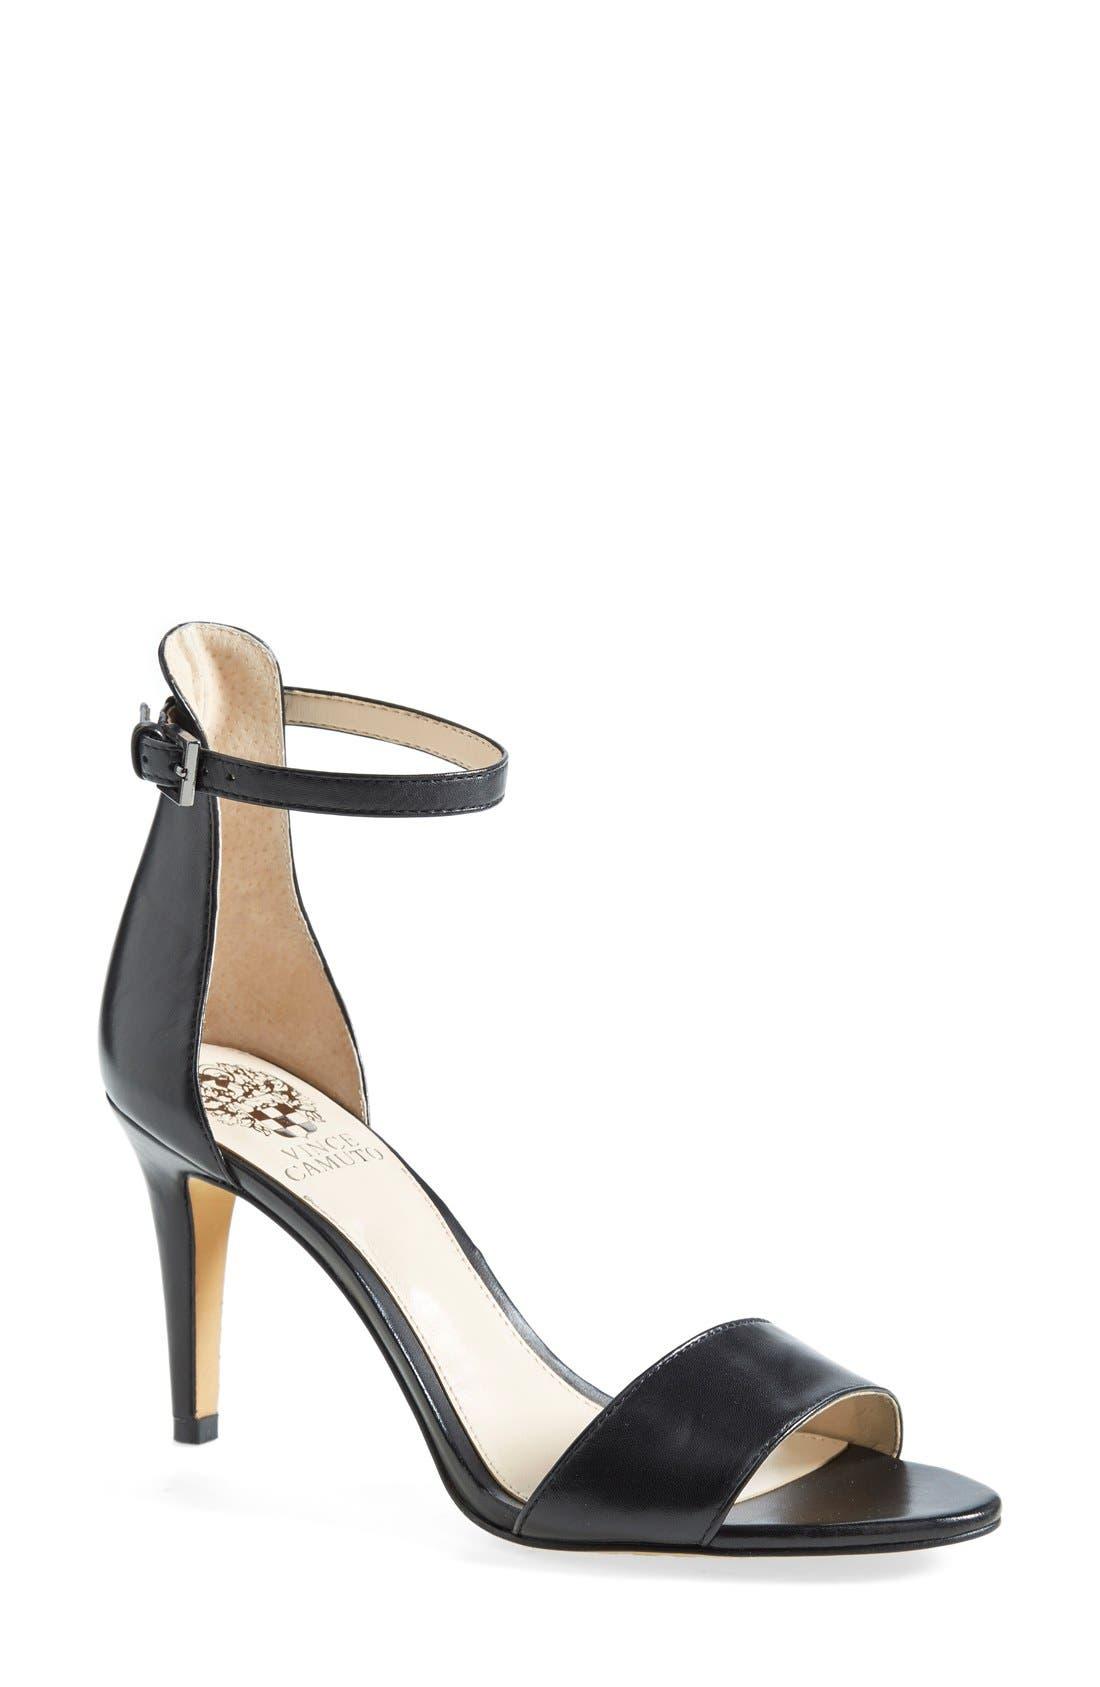 VINCE CAMUTO 'Court' Ankle Strap Sandal, Main, color, 001